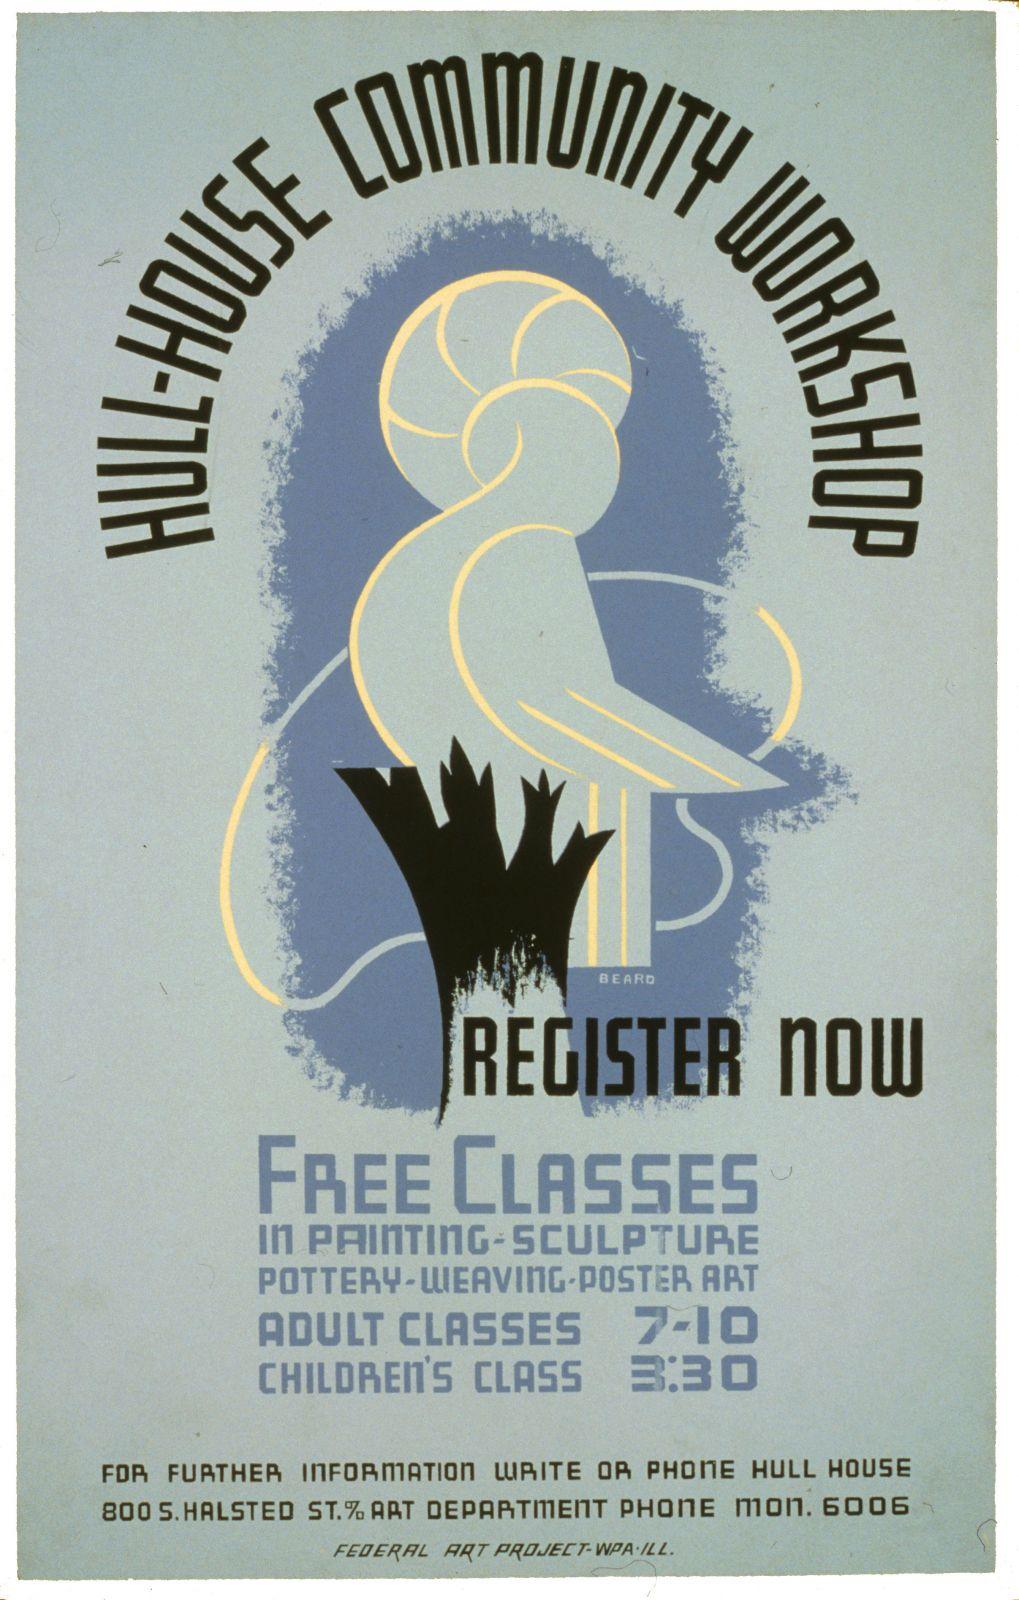 Hull-House community workshop